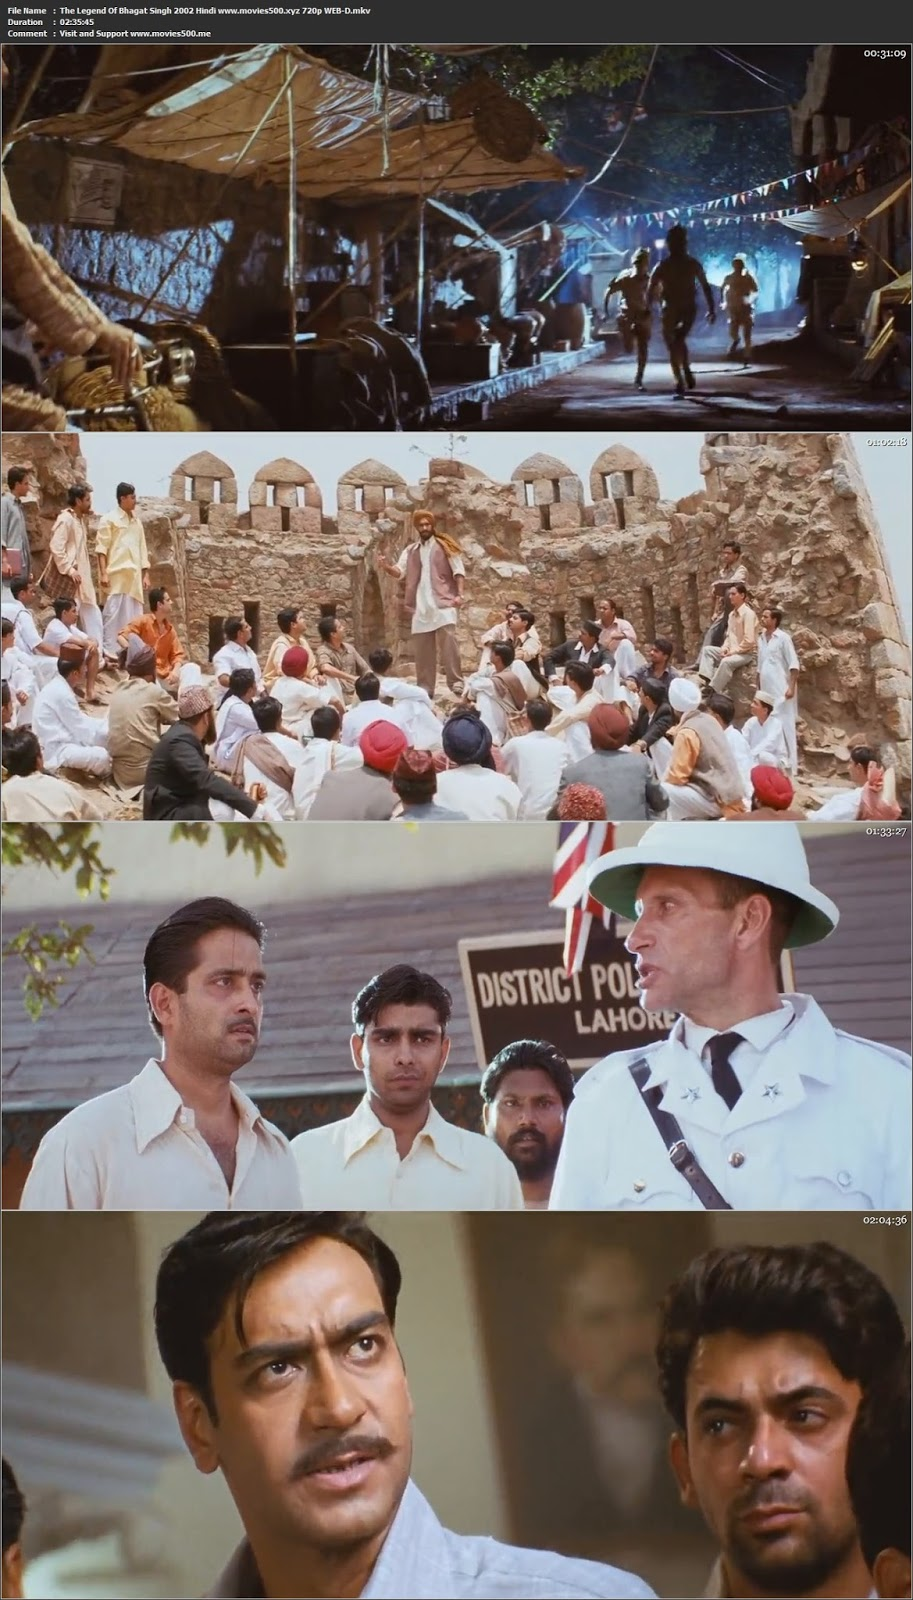 The Legend Of Bhagat Singh 2002 Hindi Full Movie WEB DL 720p at 9966132.com